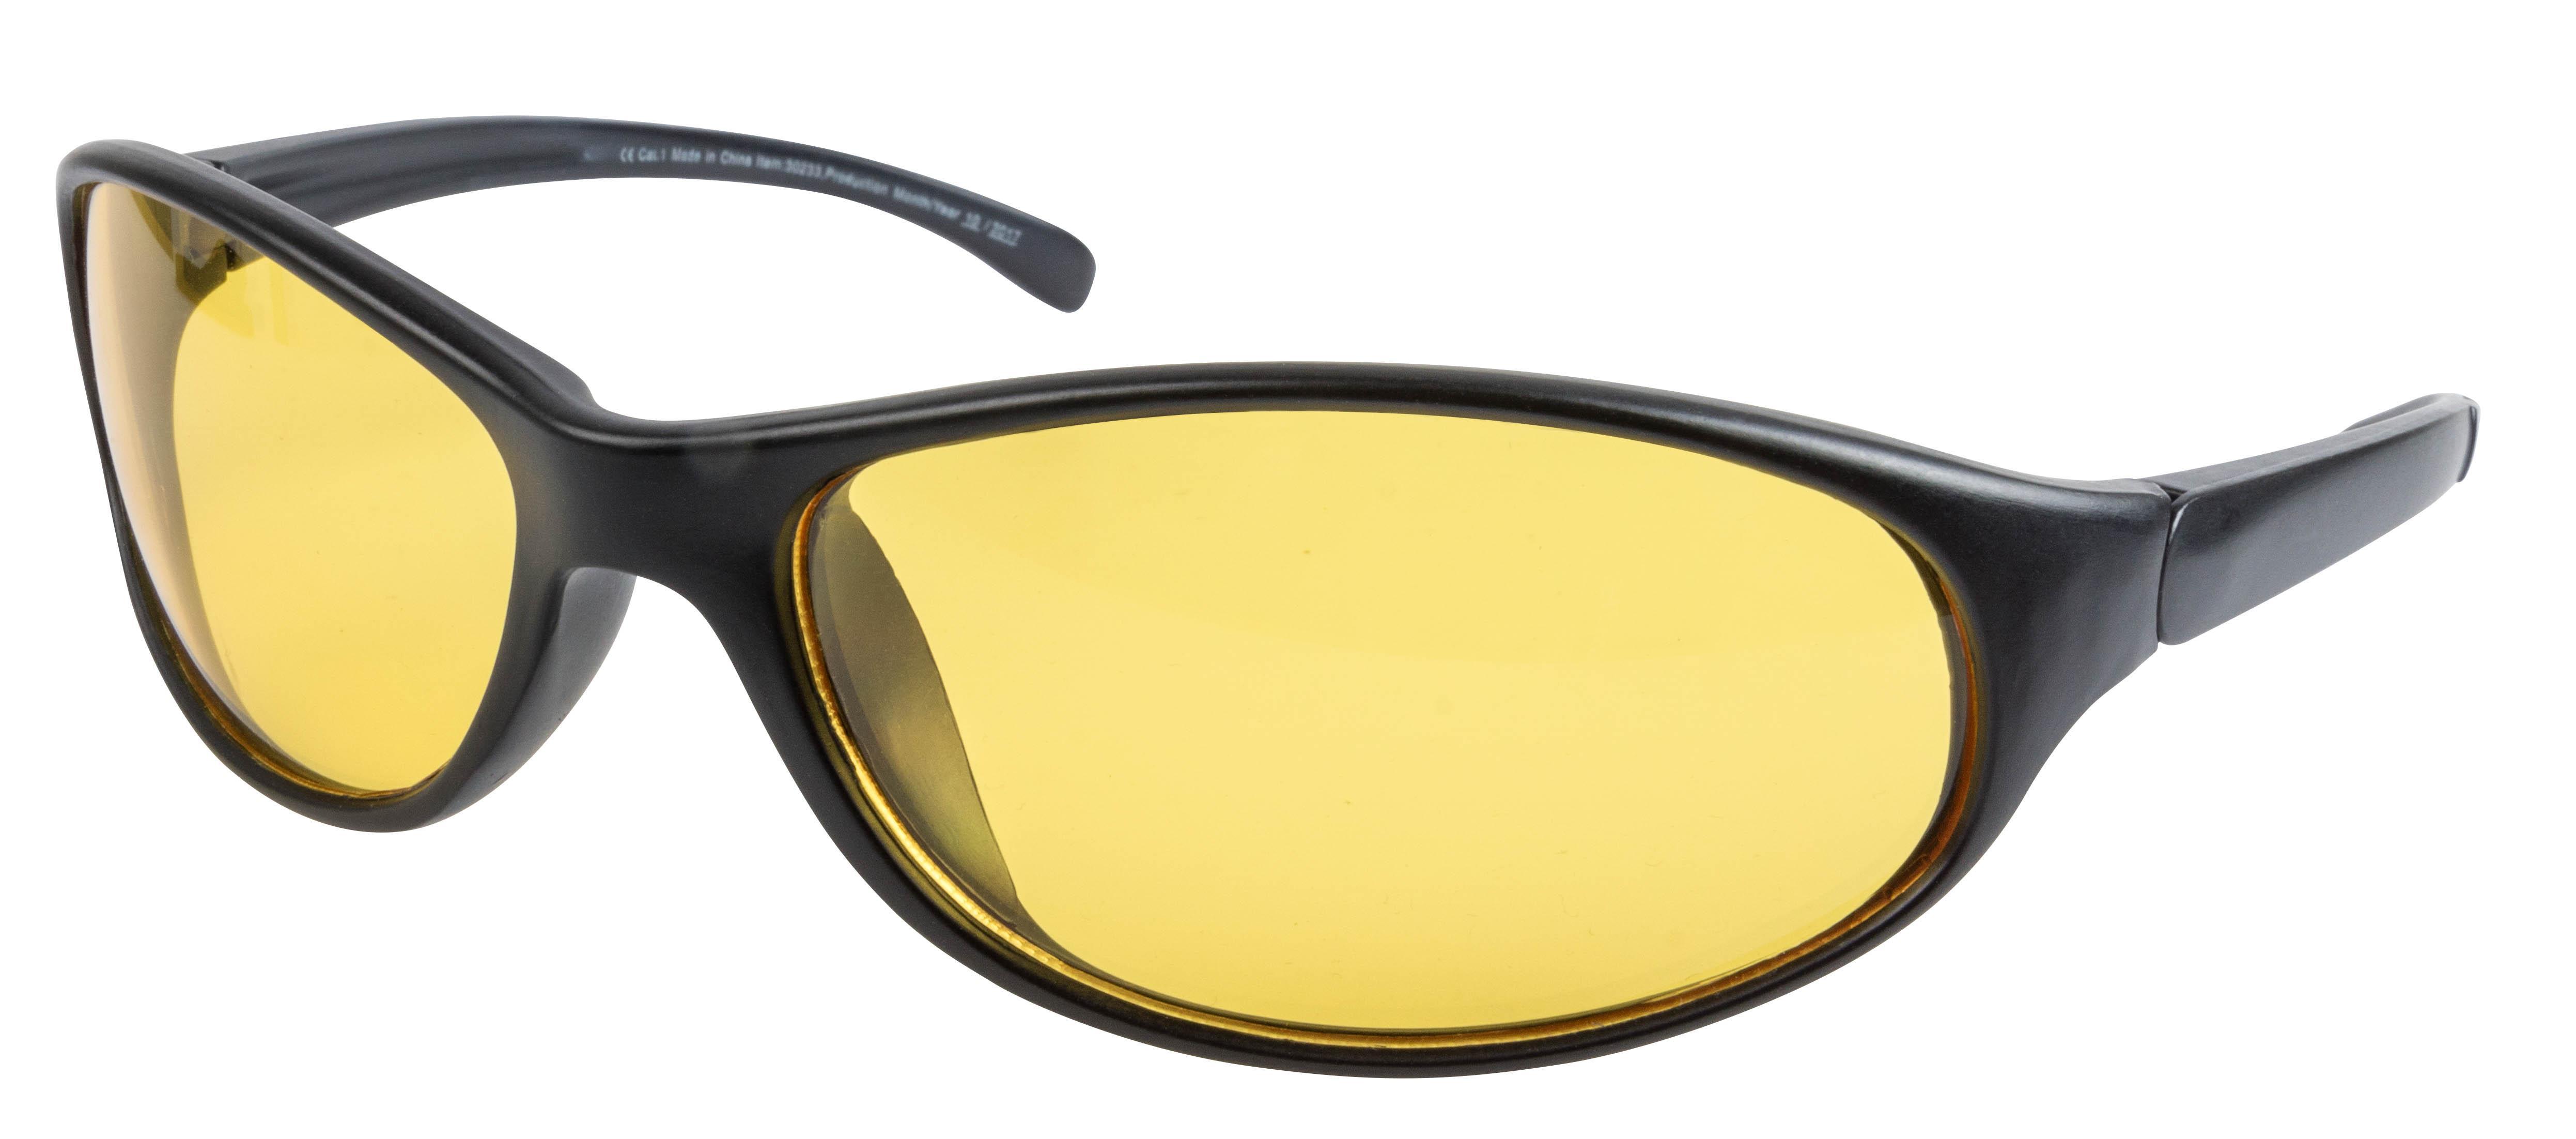 Nachtbril 30240 WALSER 30240 van originele kwaliteit